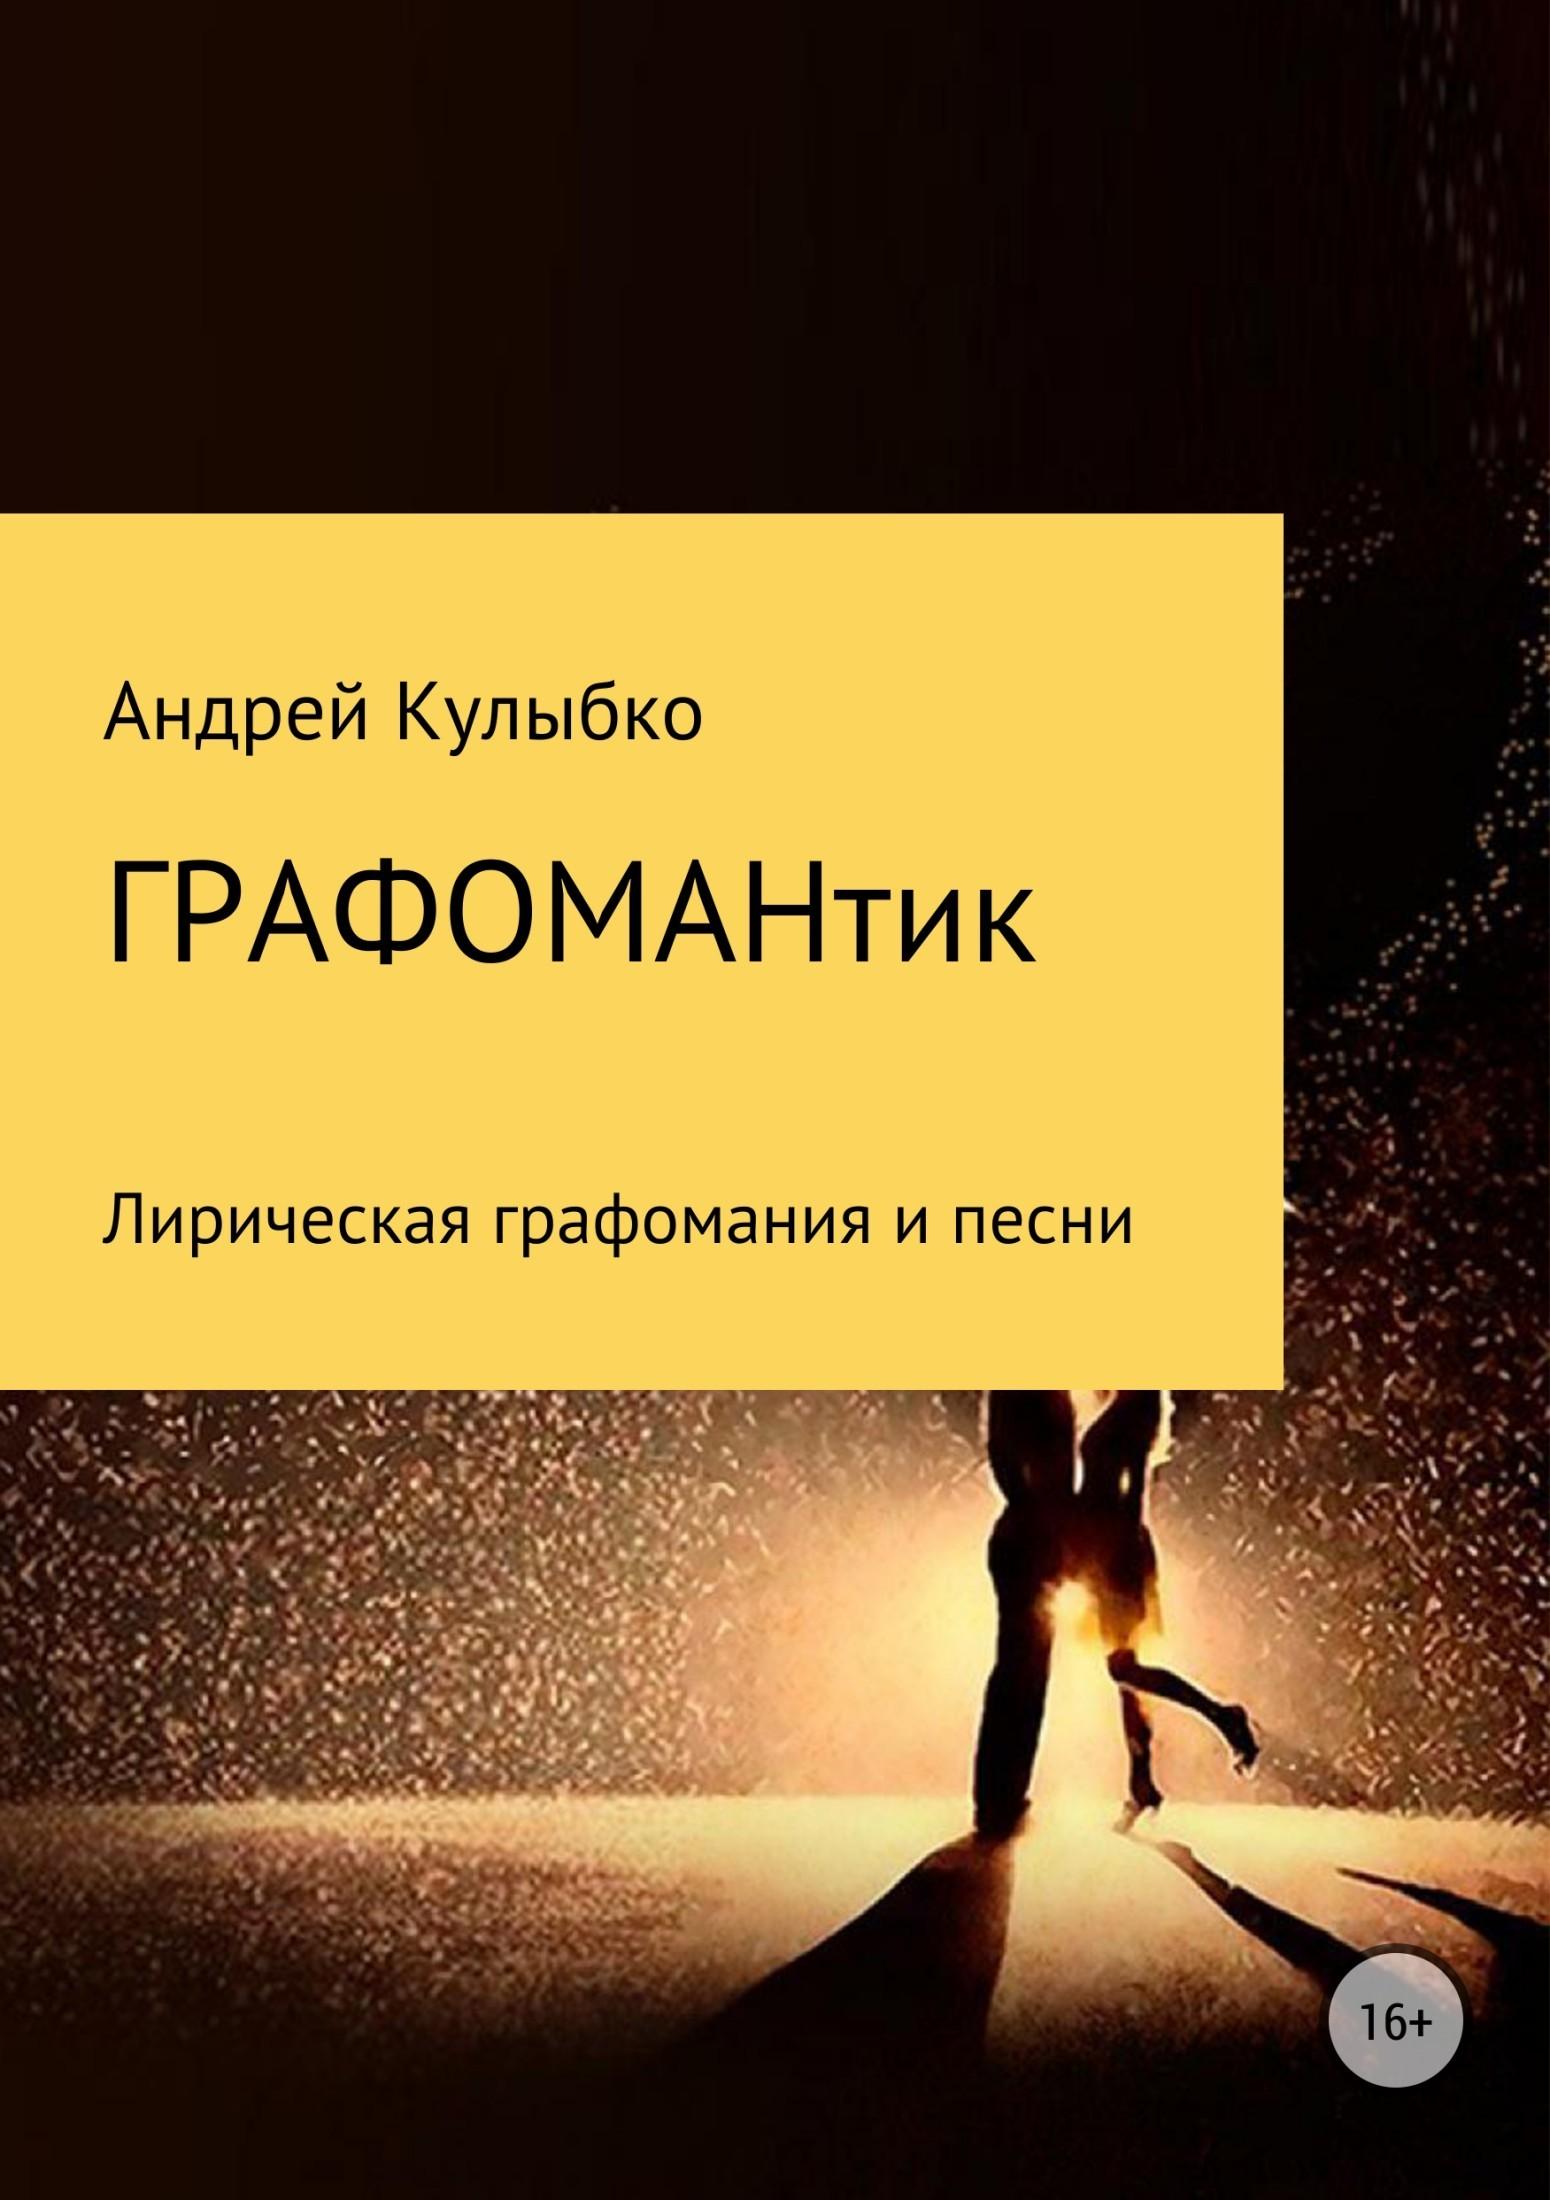 Андрей Кулыбко - Графомантик